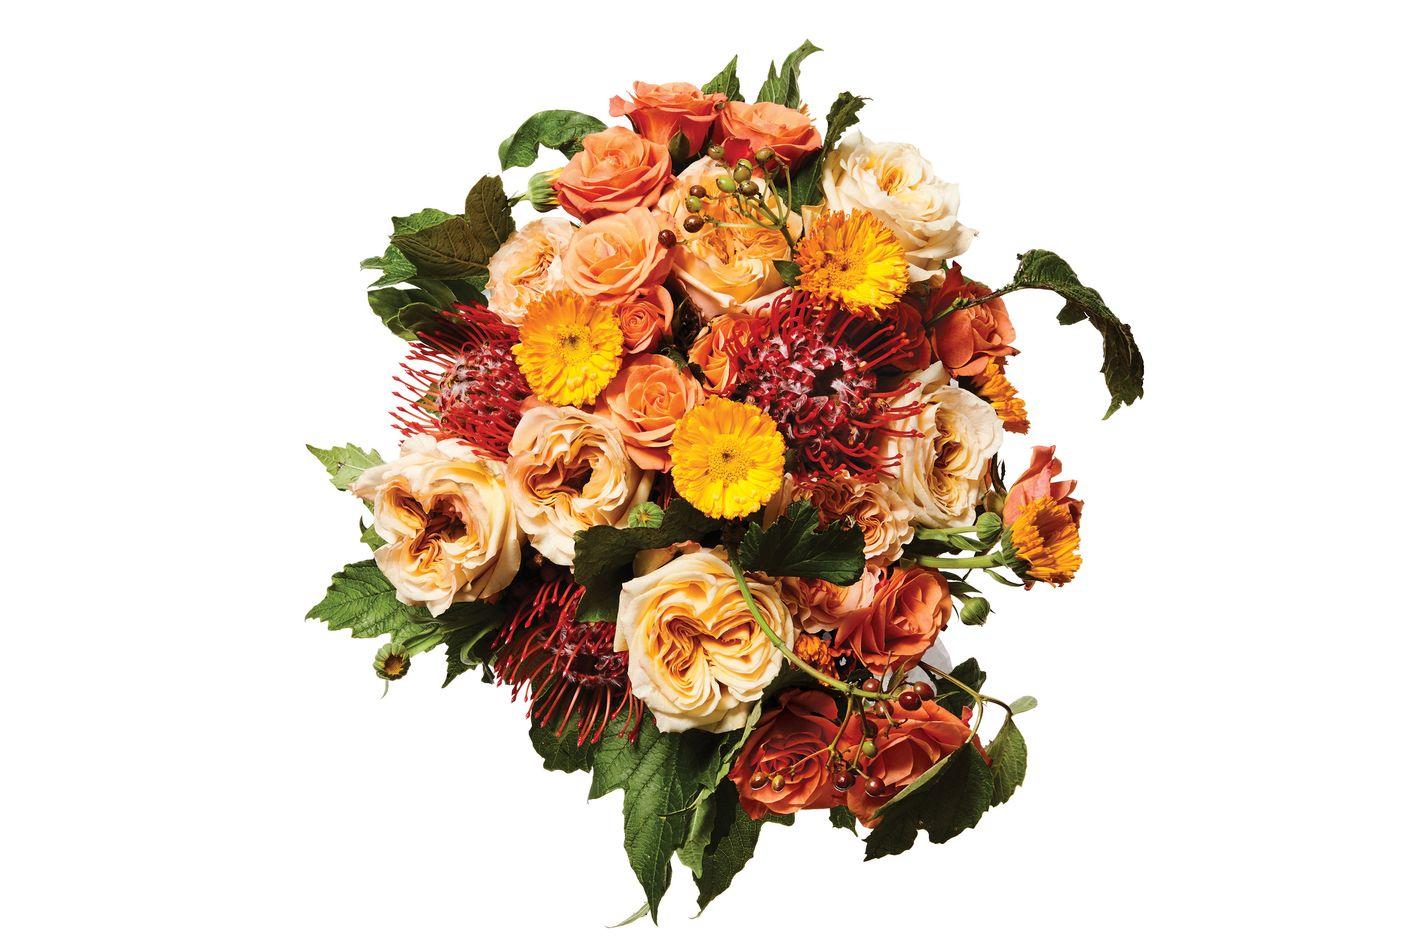 Pincushion protea, calendula, spray rose, and cranberry